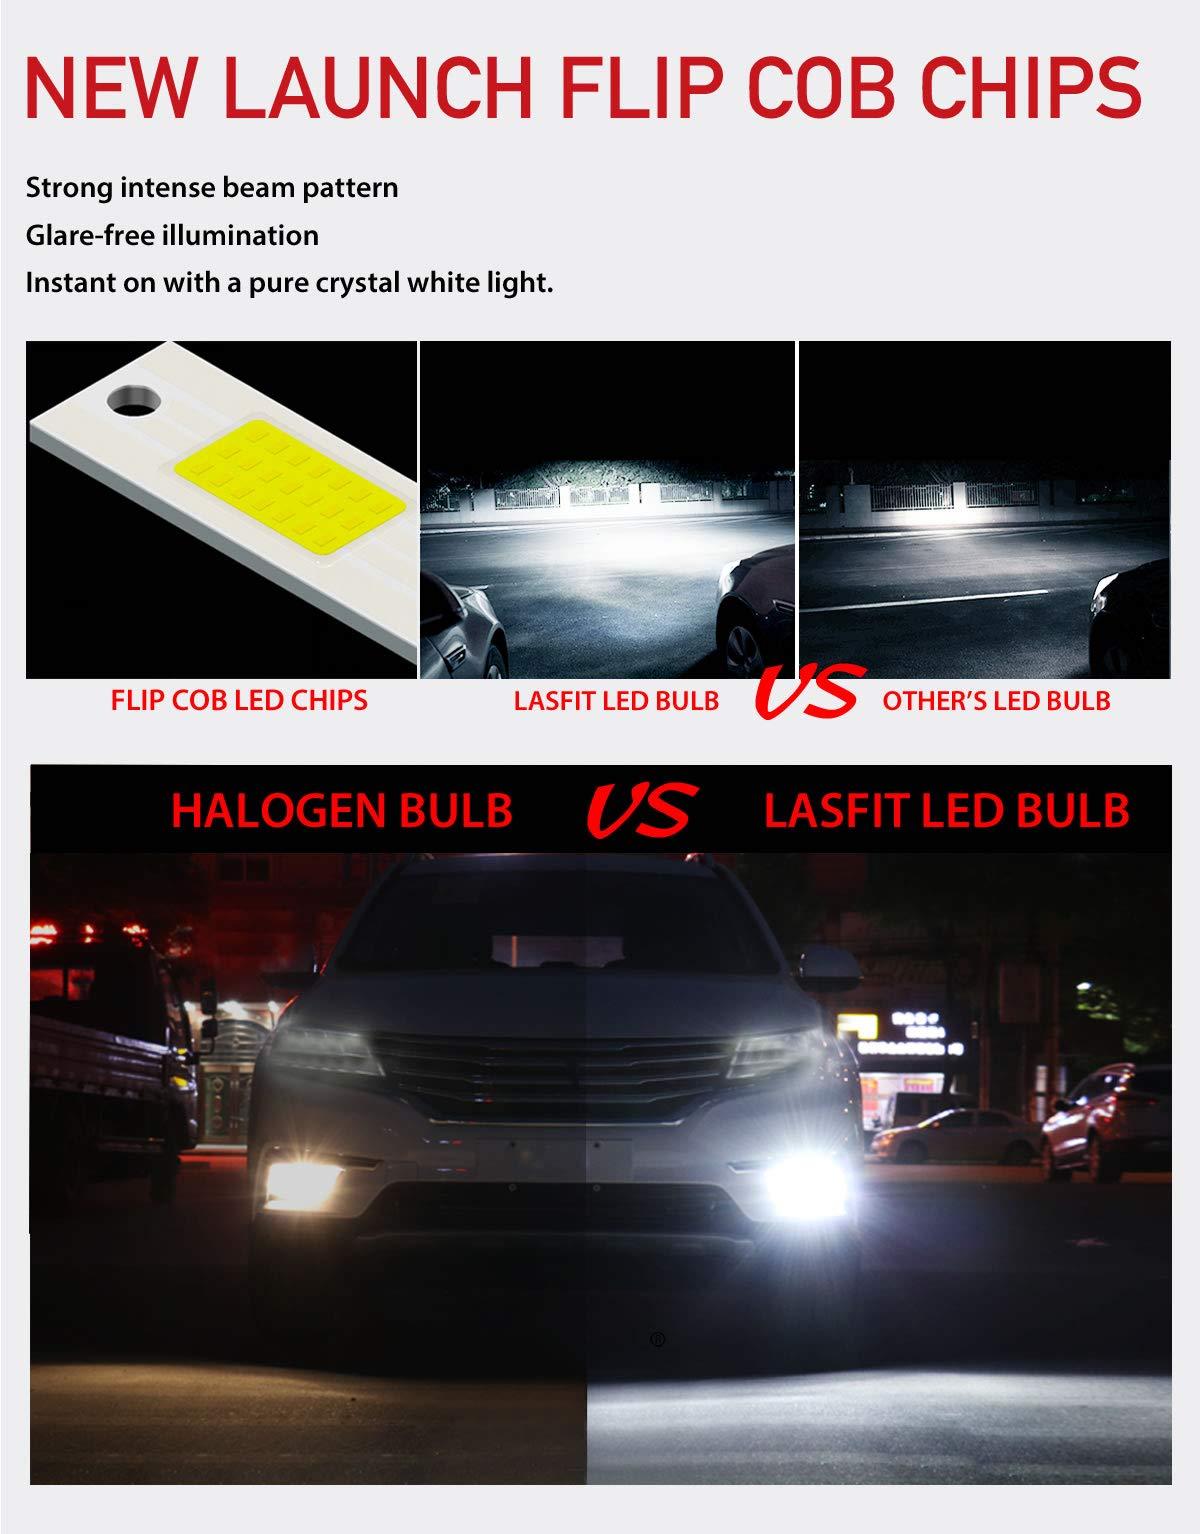 LASFIT 5202/5201/2504 LED Fog Light 60W 7600LM 6000K Cool White LED Bulbs-Plug&Play (2 pack) by LASFIT (Image #4)